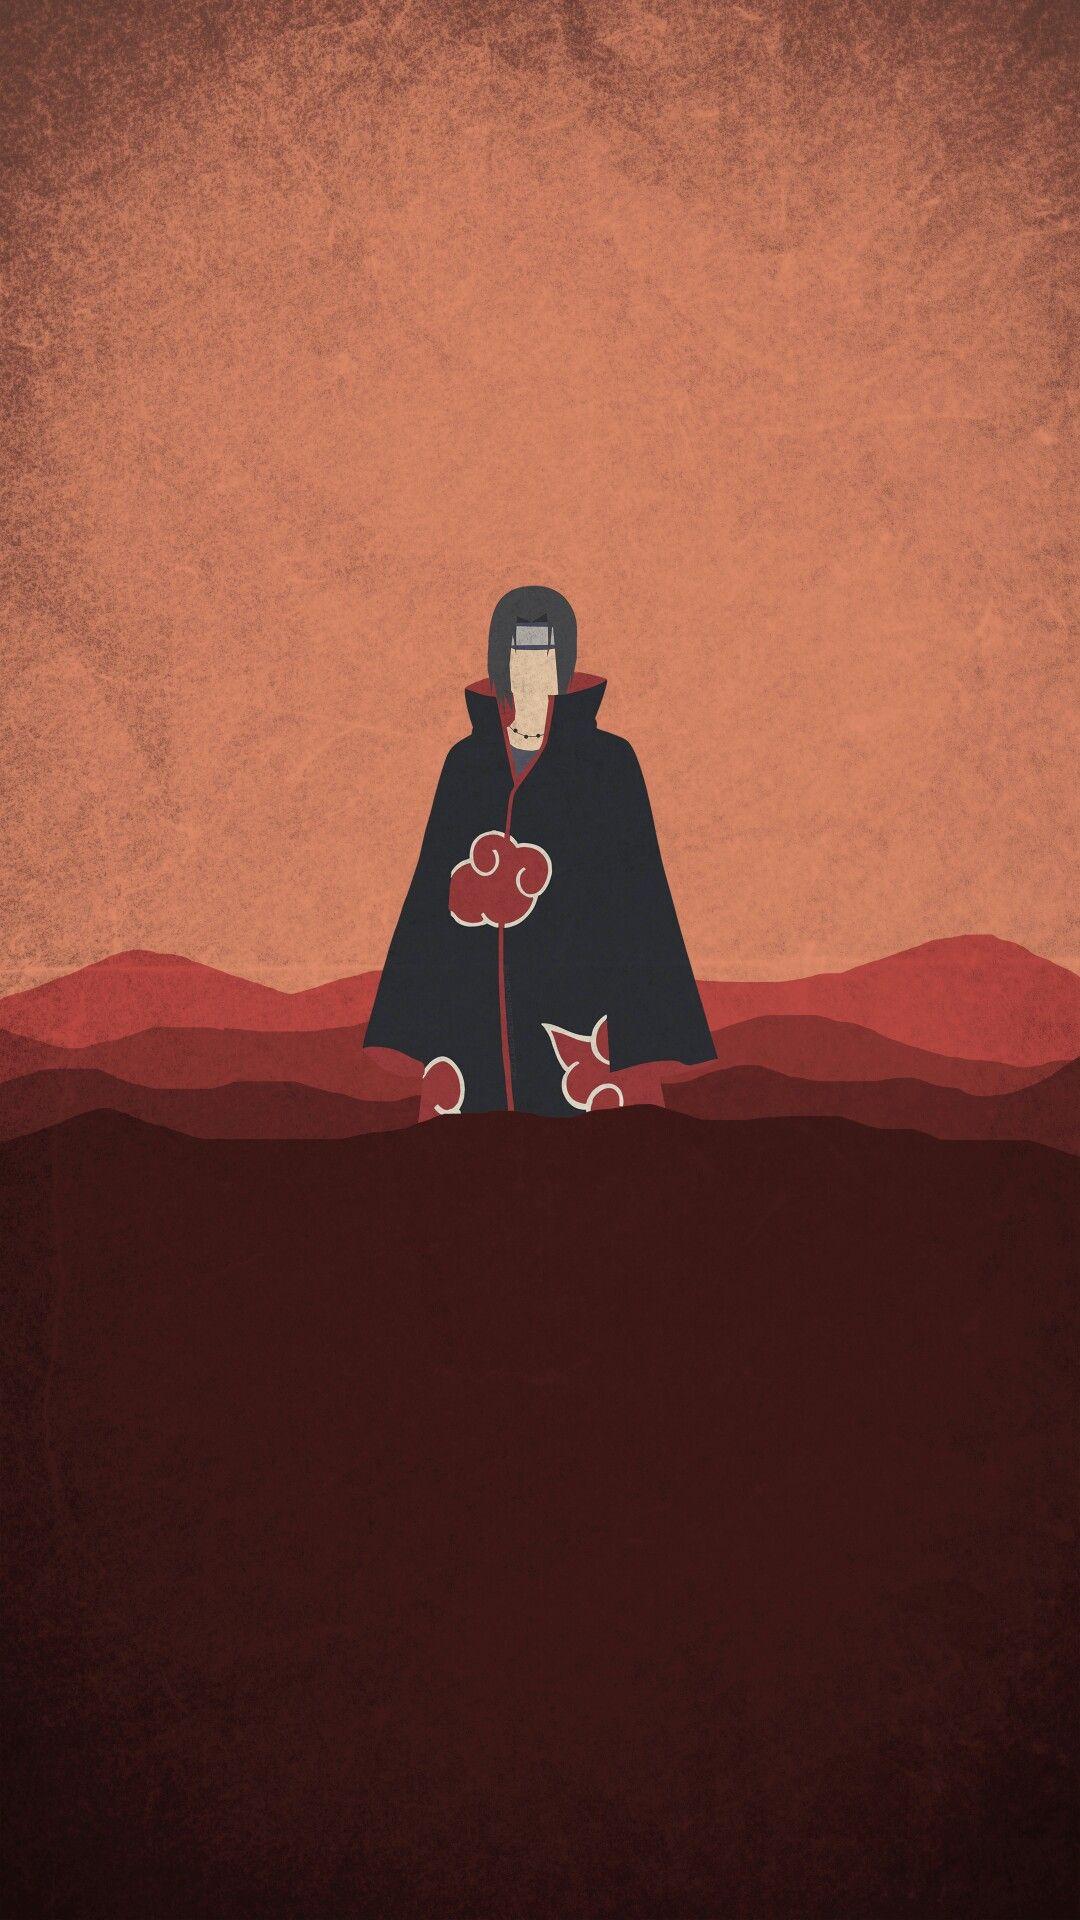 [4K] Naruto Minimal Mobile Wallpapers Remastered http